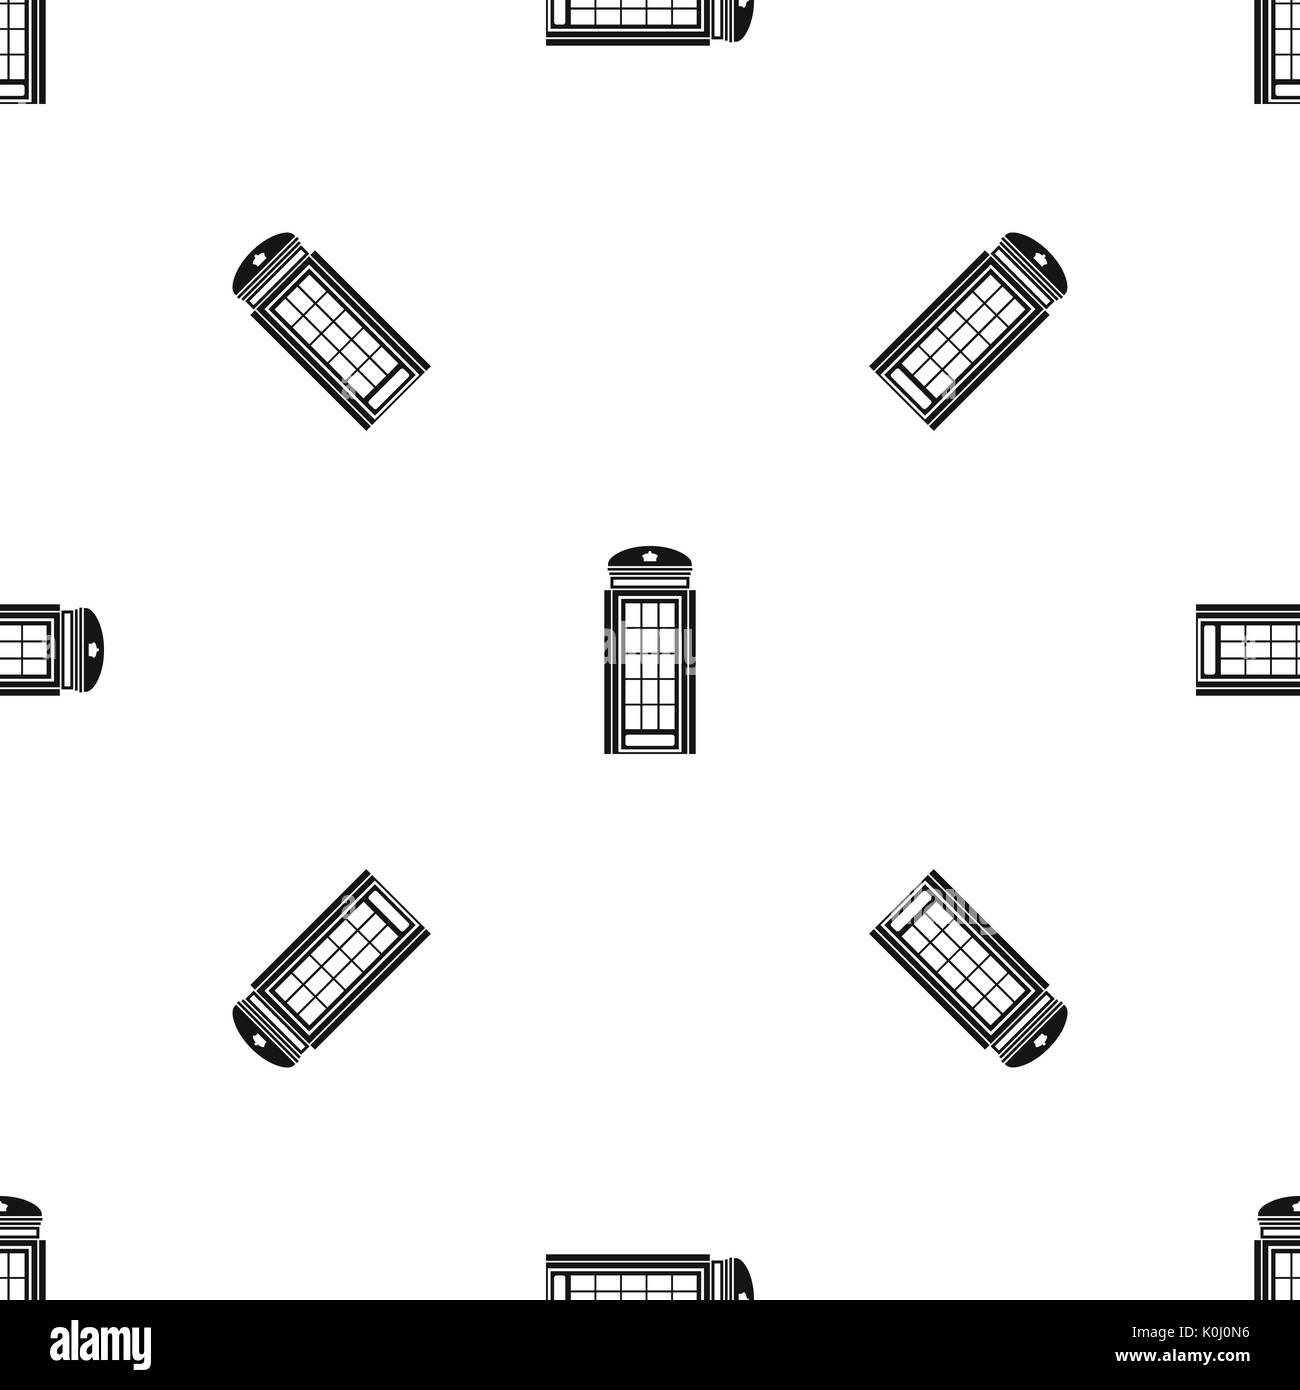 phone booth pattern seamless black stock vector art illustration rh alamy com